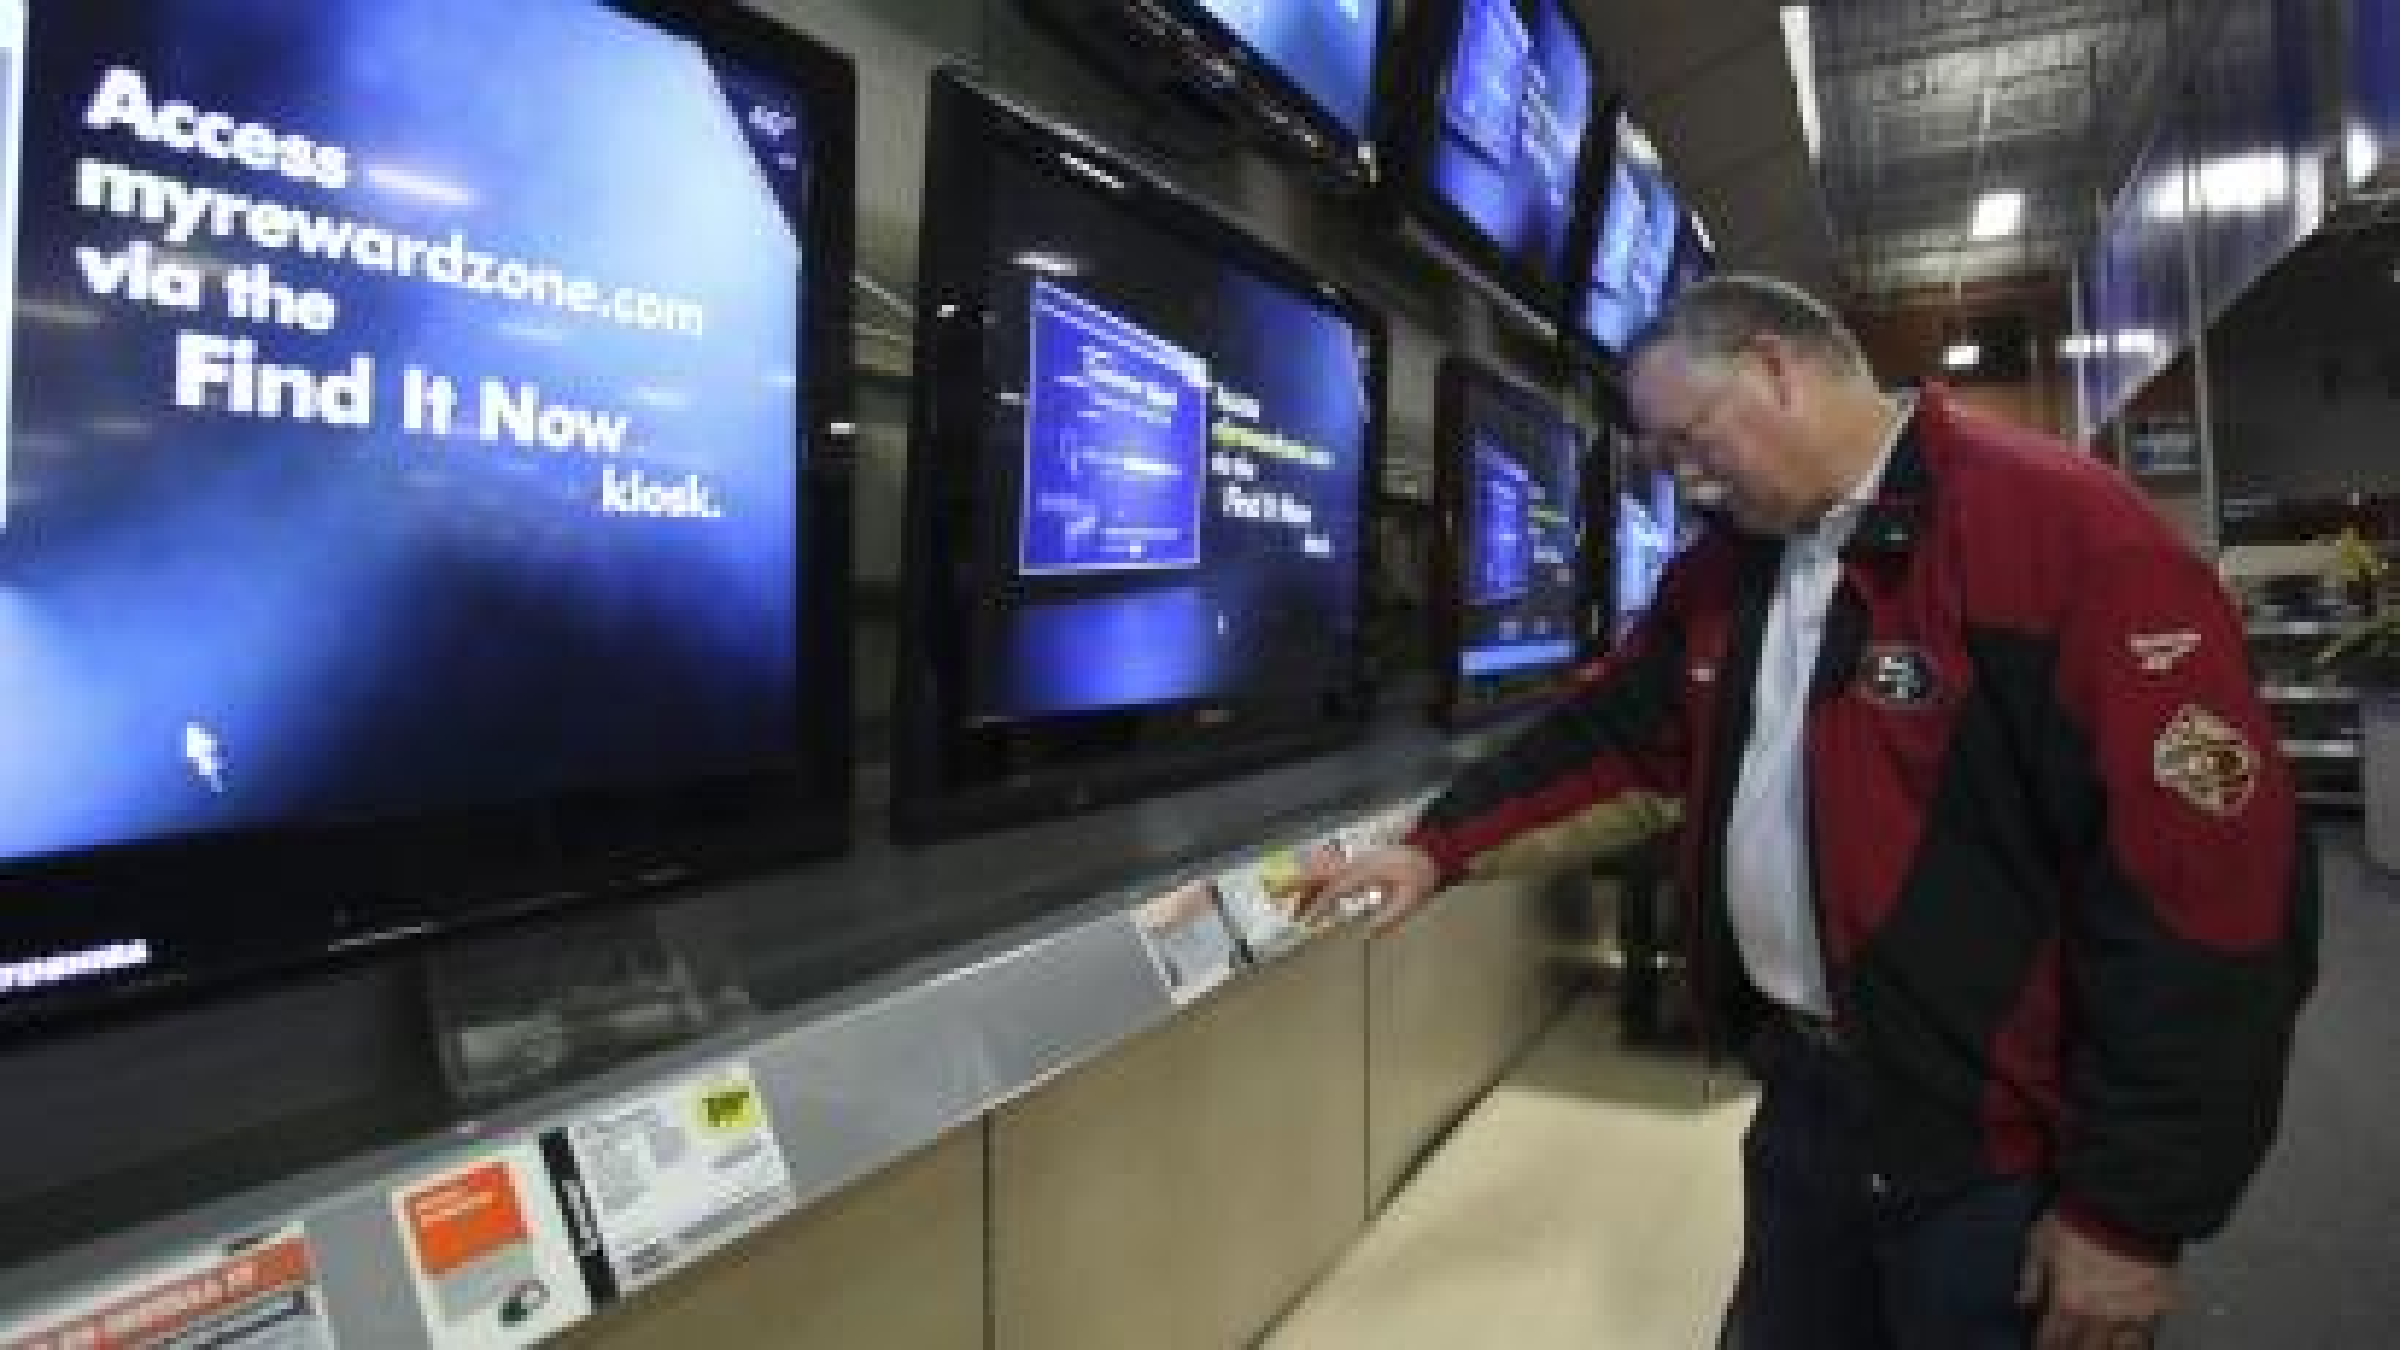 A man looks at TV screens